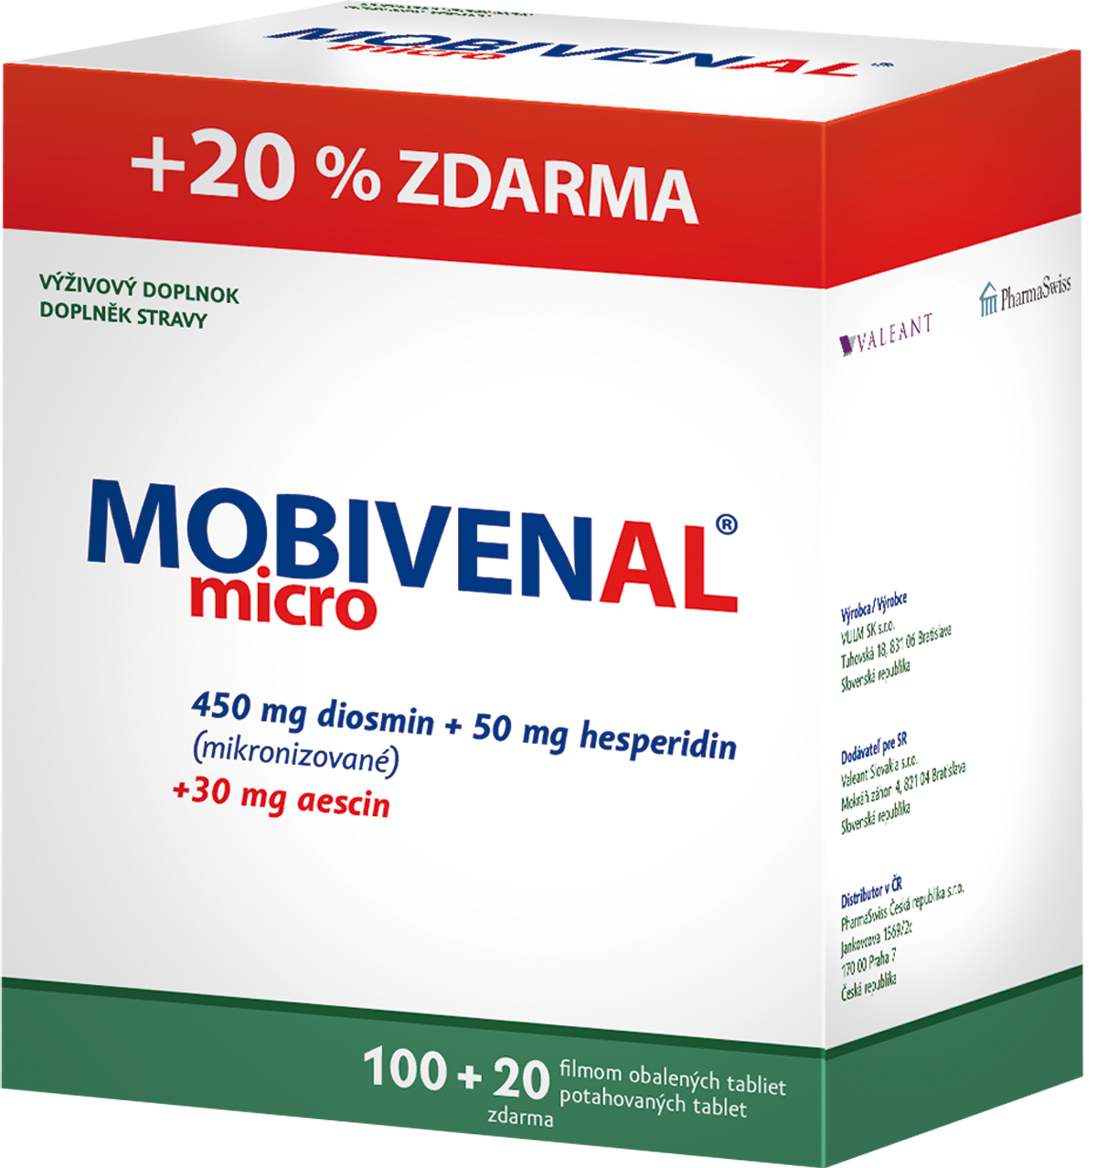 mobivenal micro 100